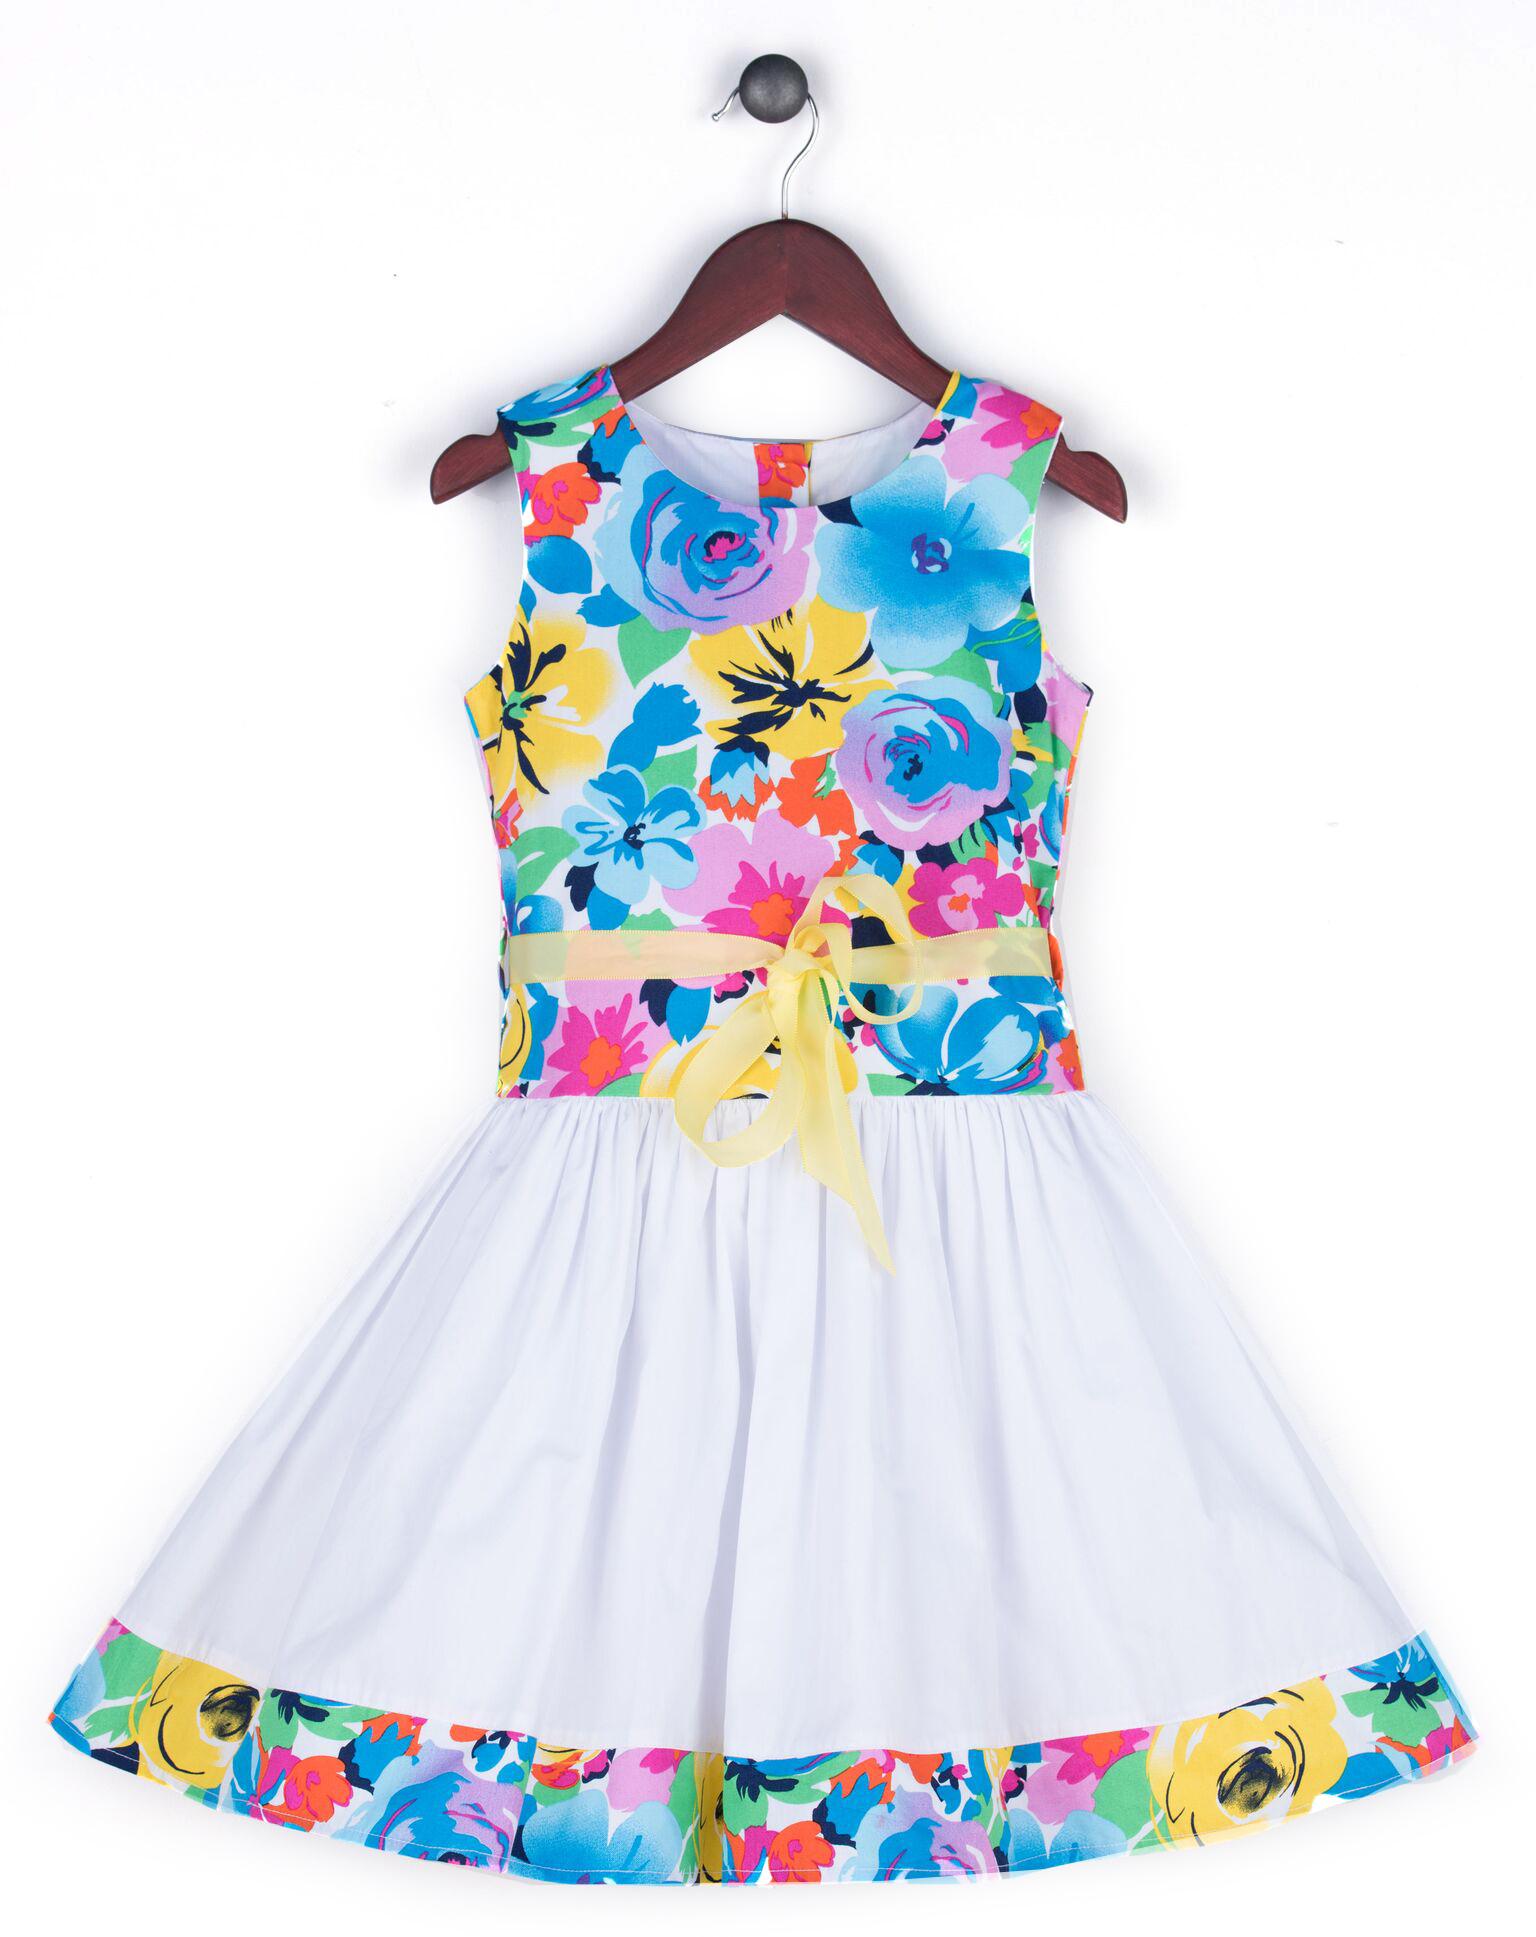 Joe and Ella Fashion Dievčenské šaty Miley kvetované - modro-biele ... eddc5572f65